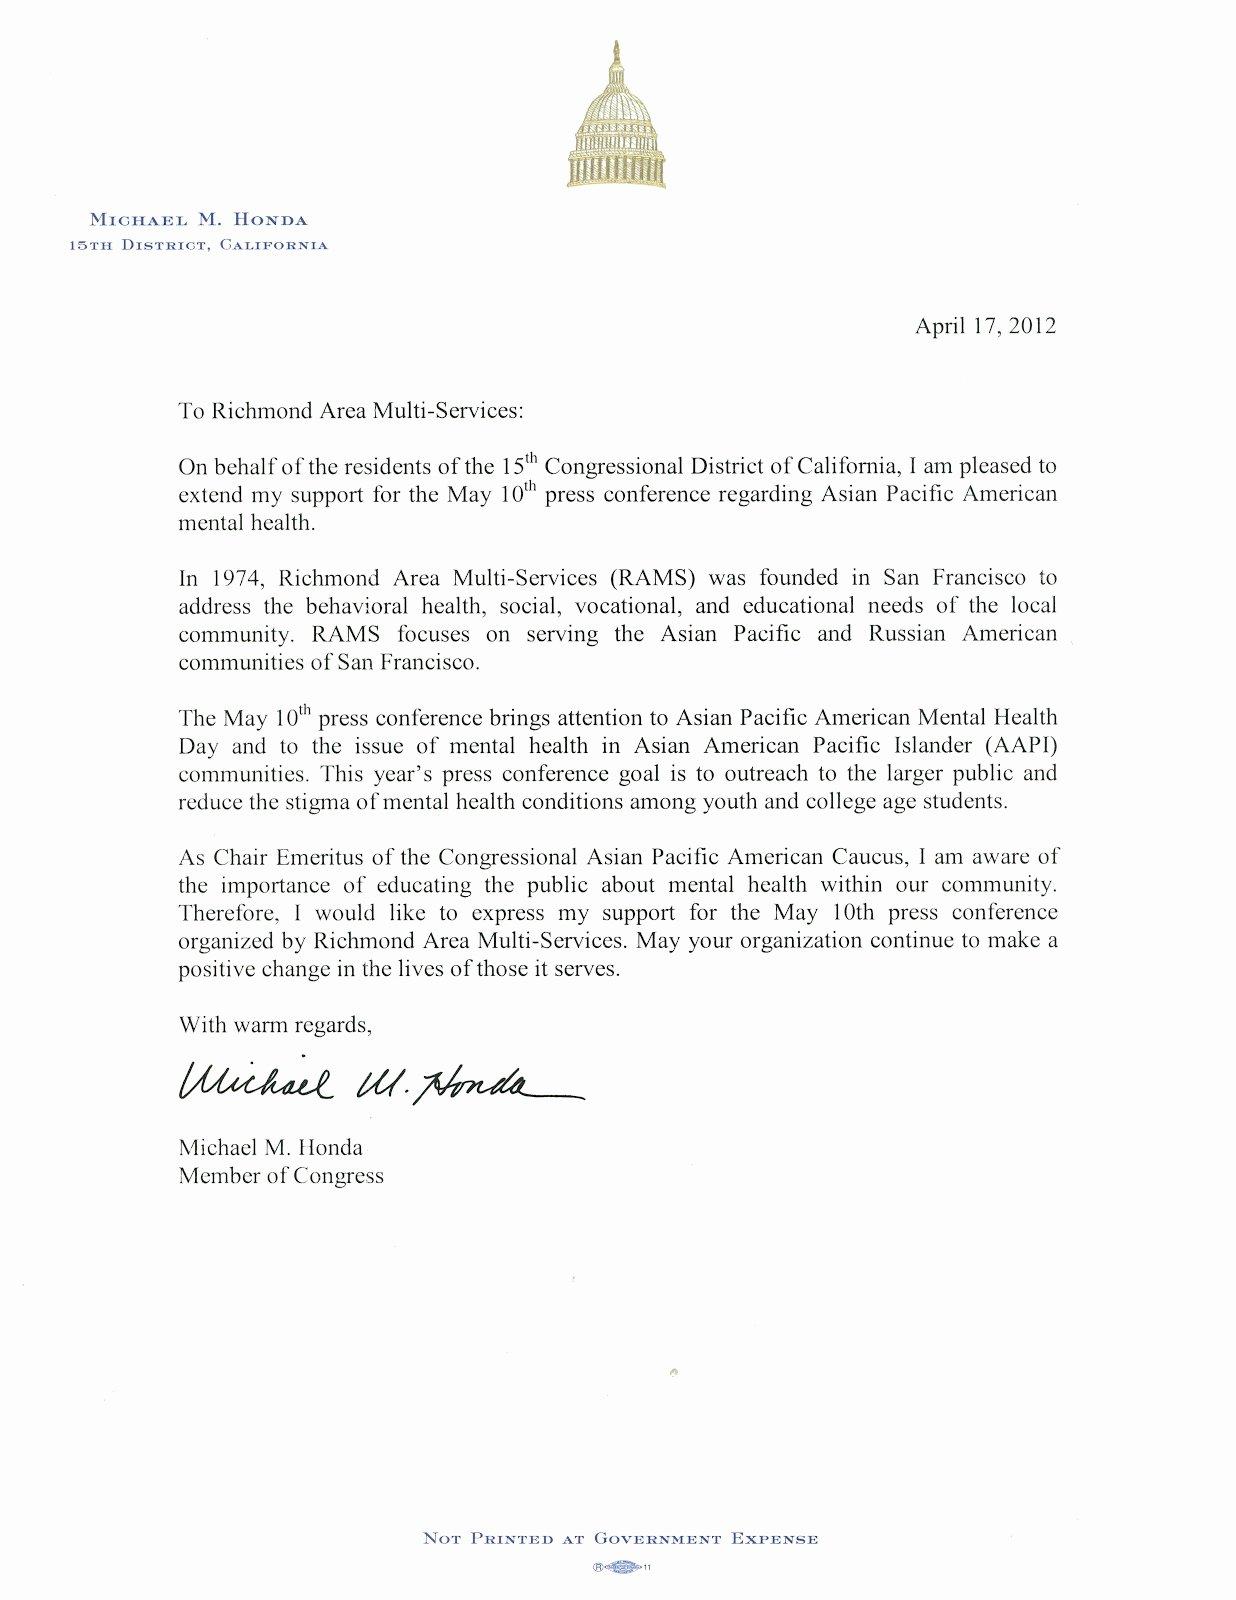 Letter to Congressman format Elegant Letter to Congressman Rams A Prehensive Mental Health